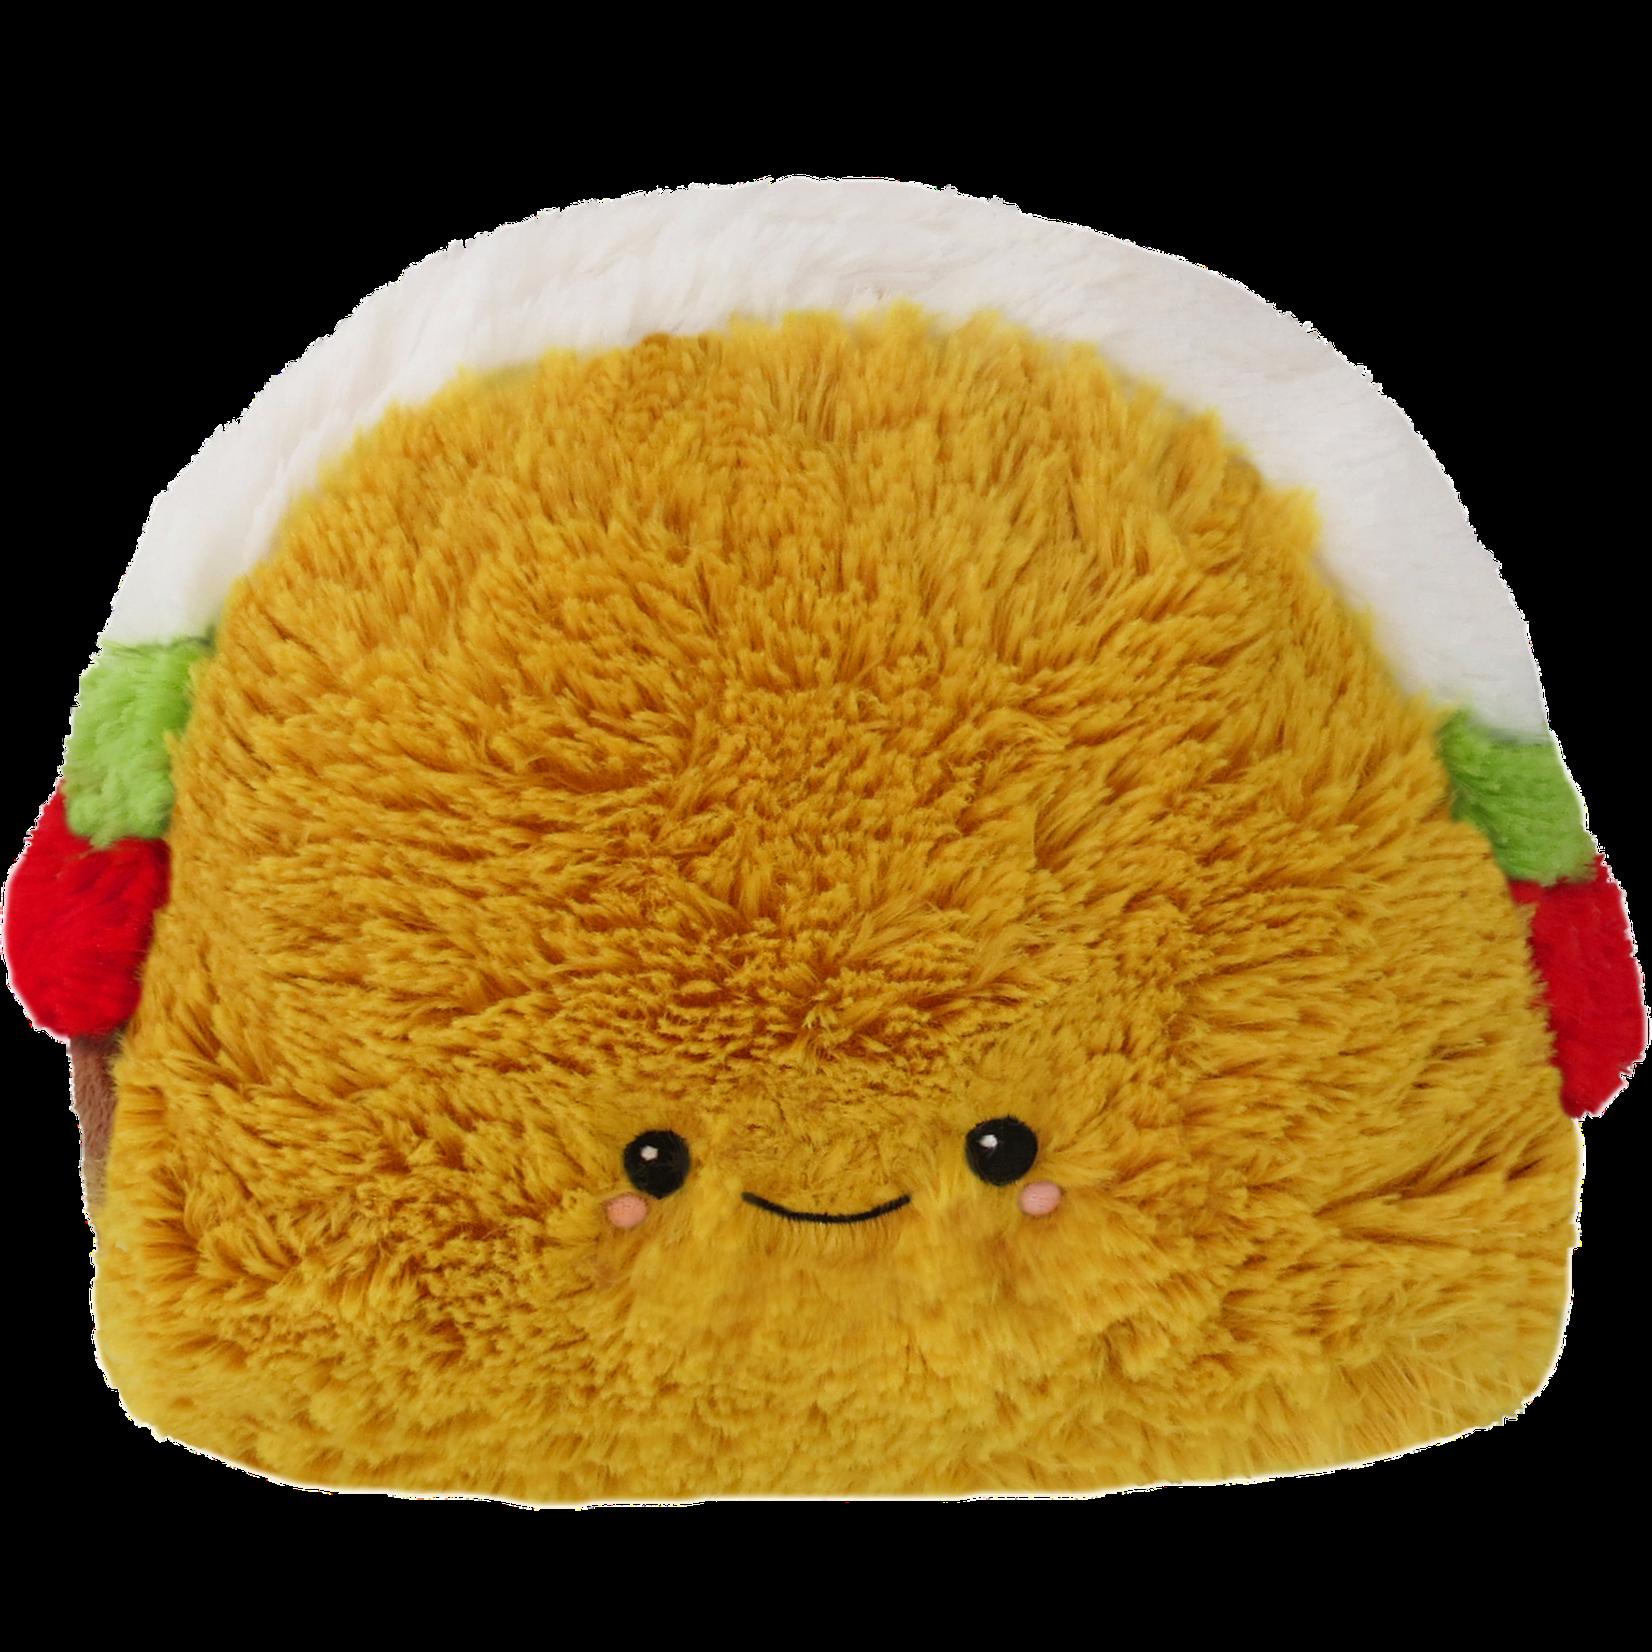 Taco - Mini Comfort Food